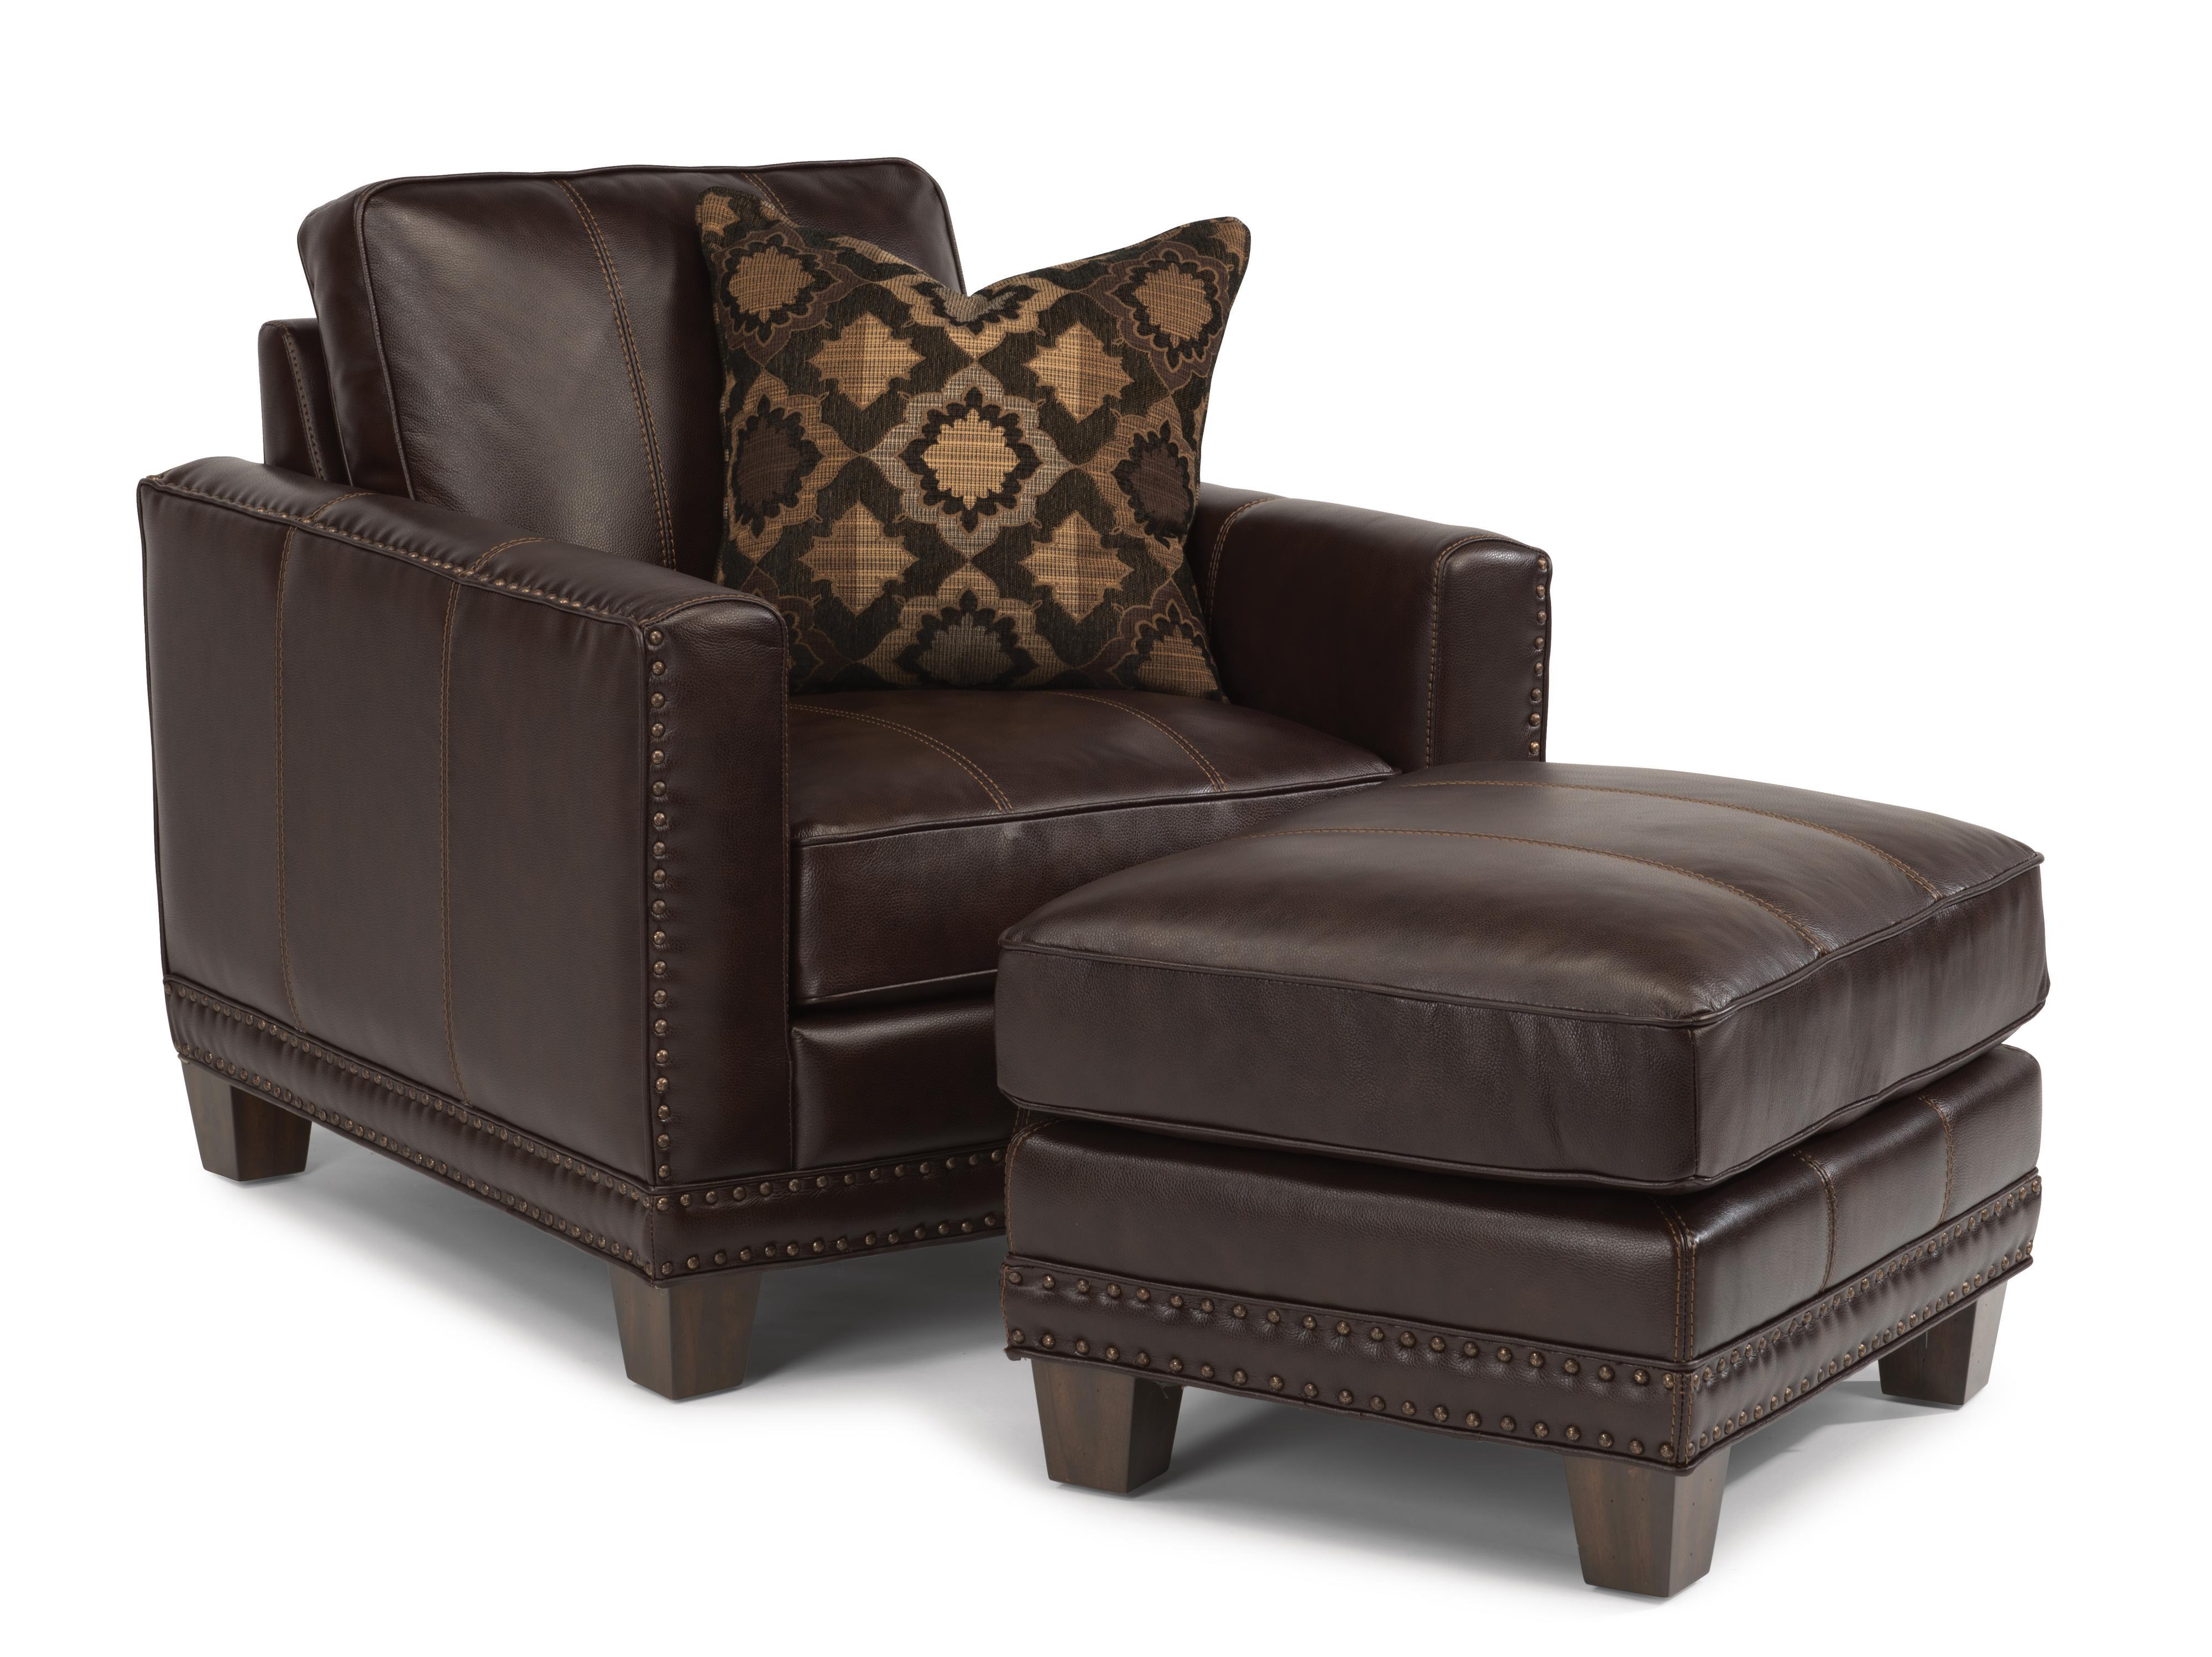 Latitudes - Port Royal Chair & Ottoman  by Flexsteel at Walker's Furniture